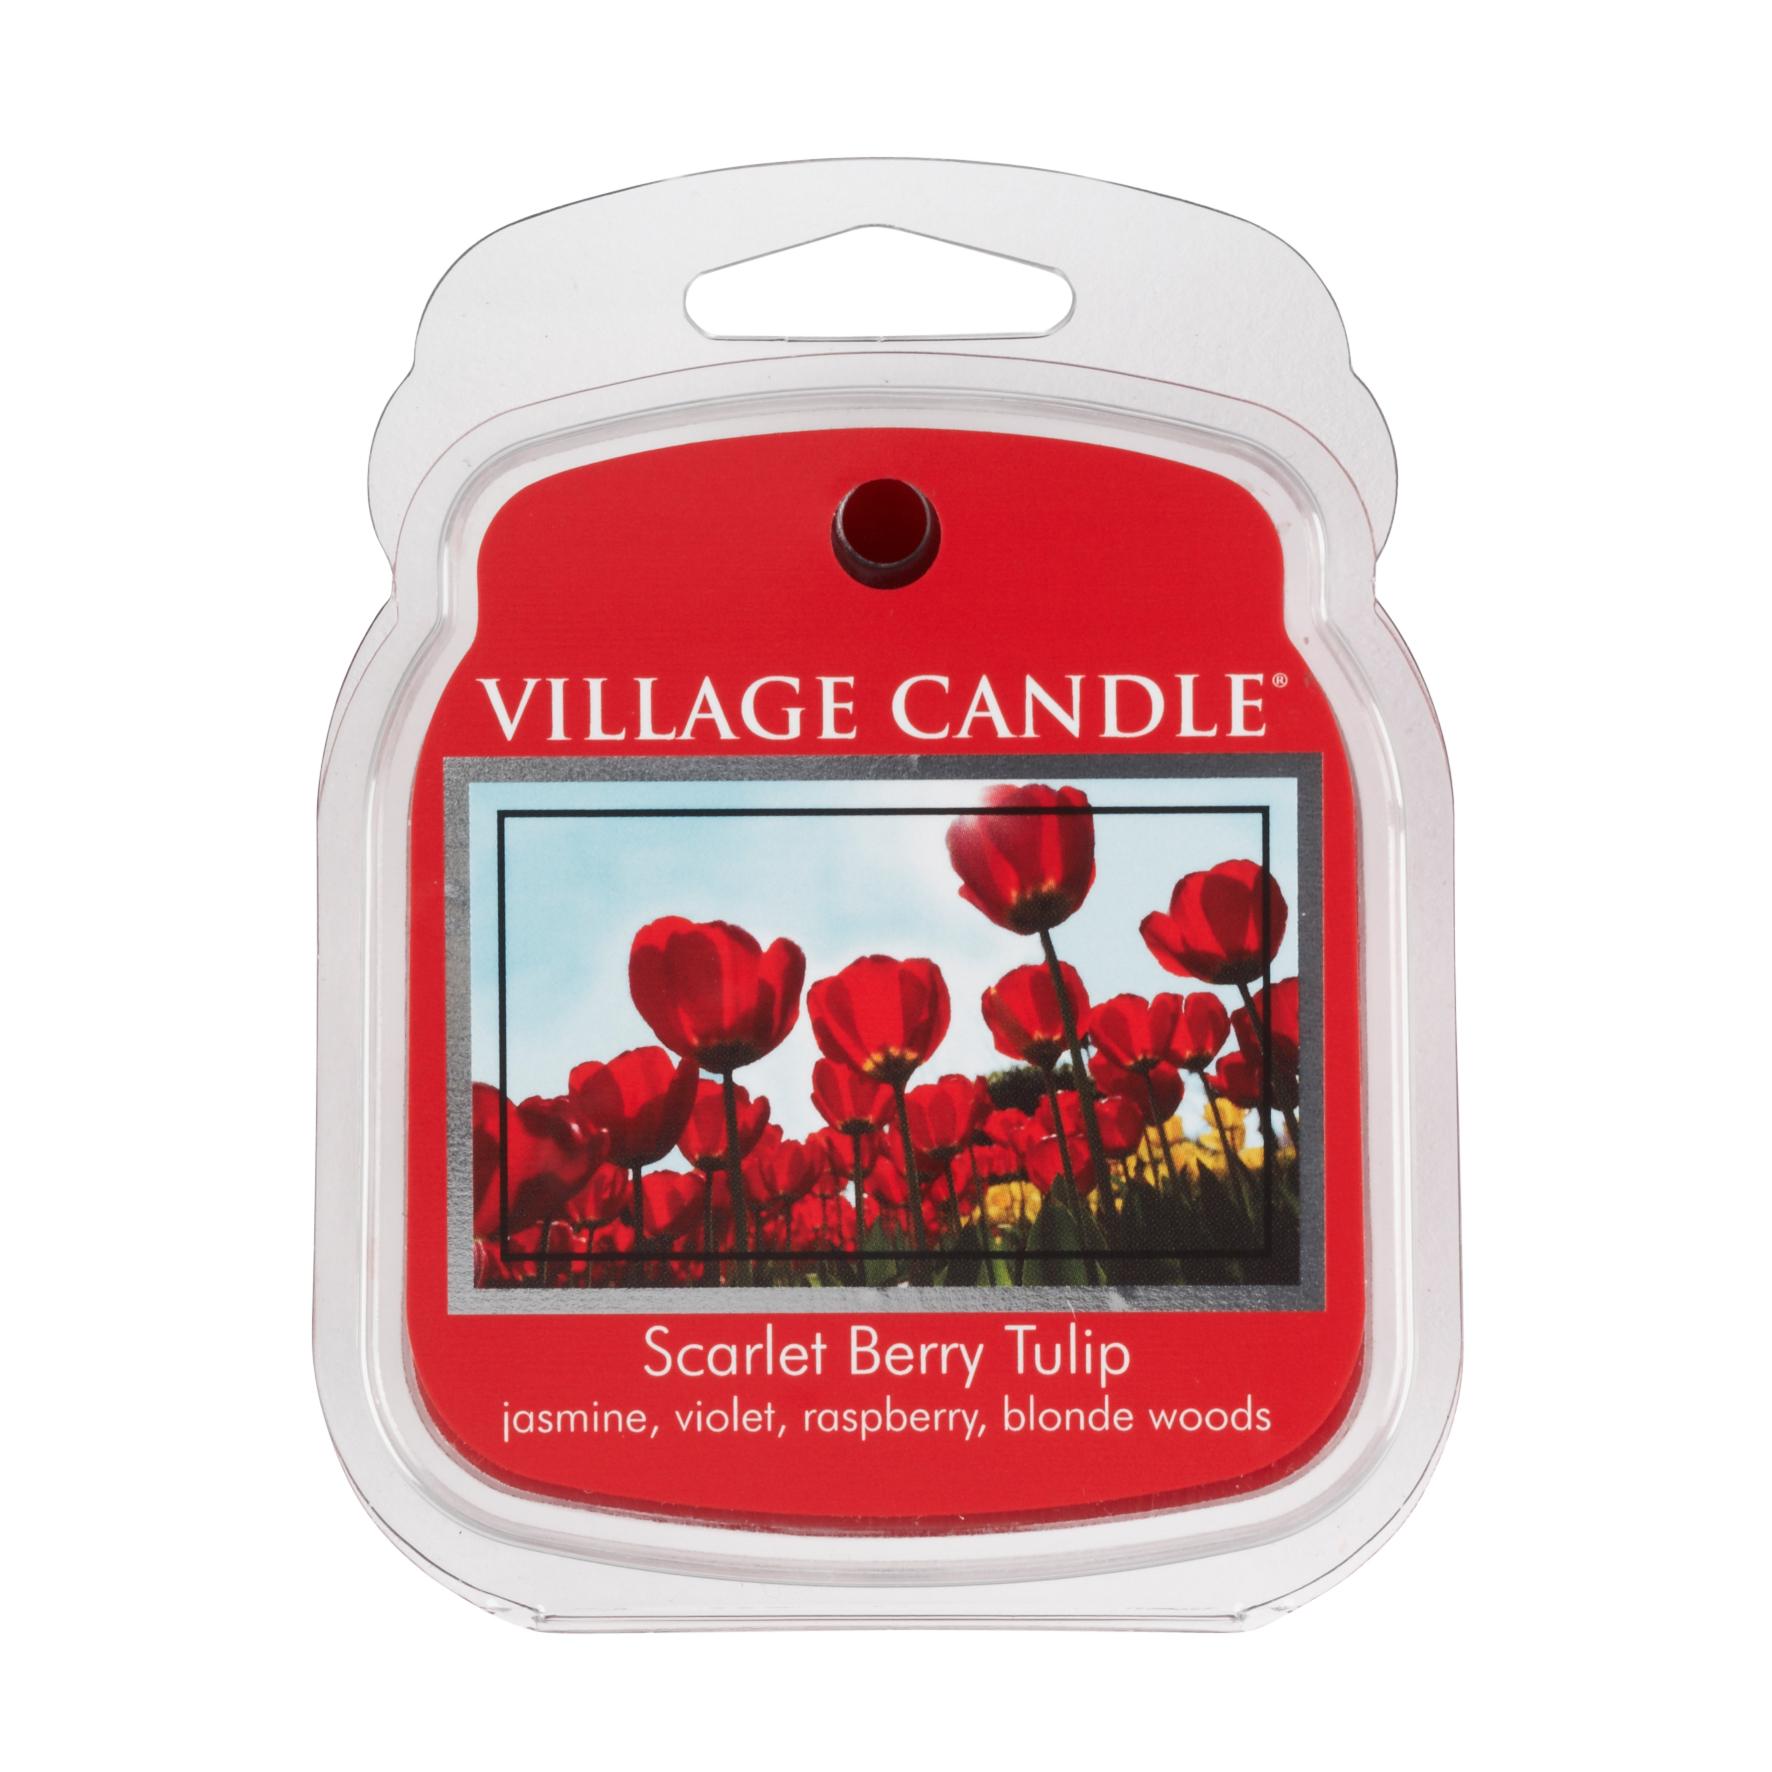 Scarlet Berry Tulip Premium Wax Melt Pack